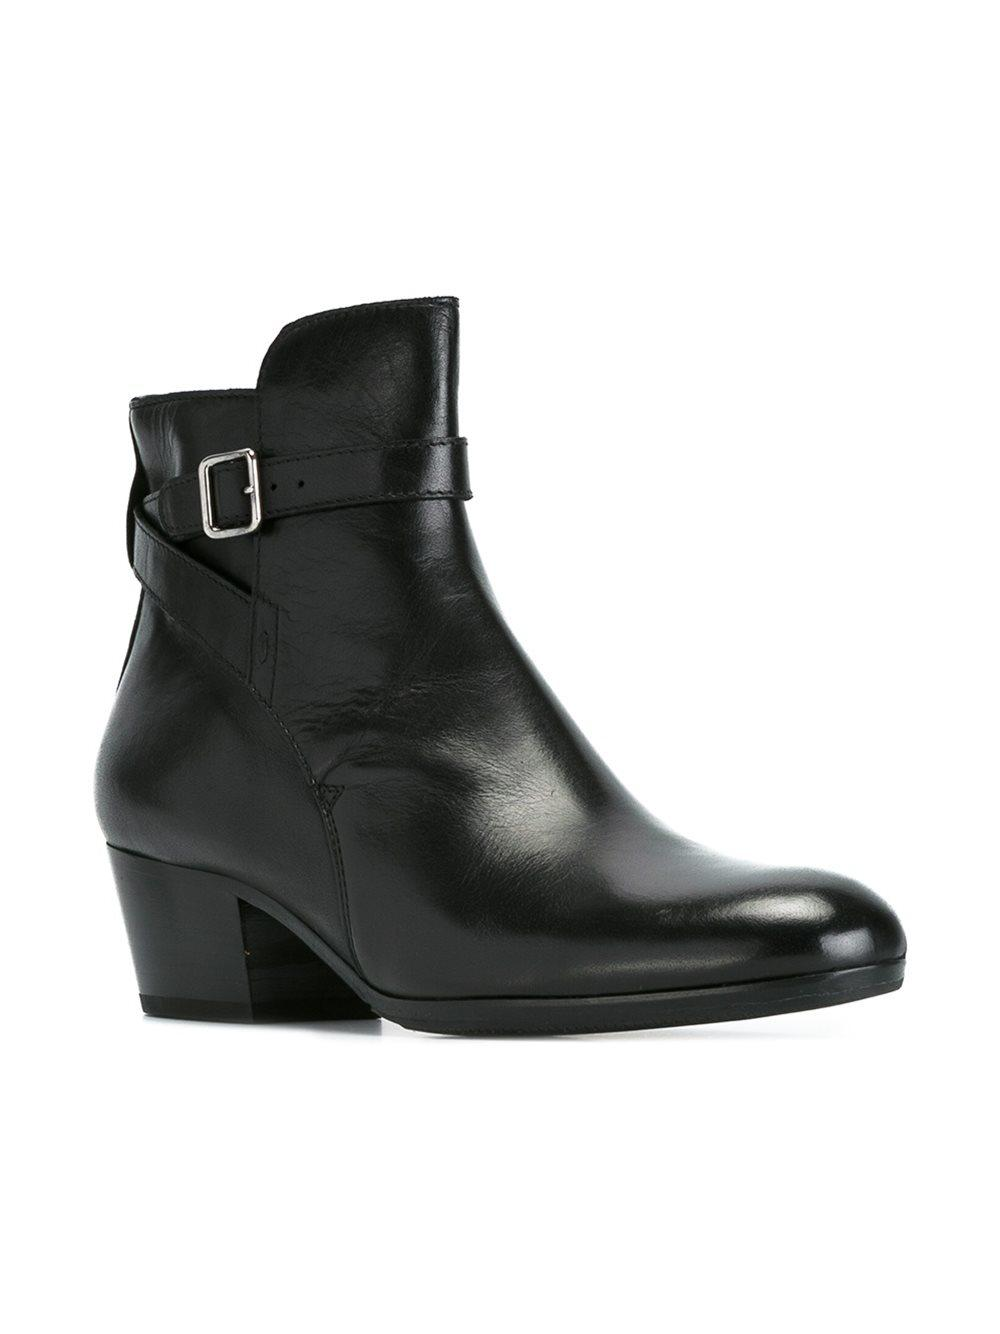 HENDERSON BARACCO Boots Maremma leather